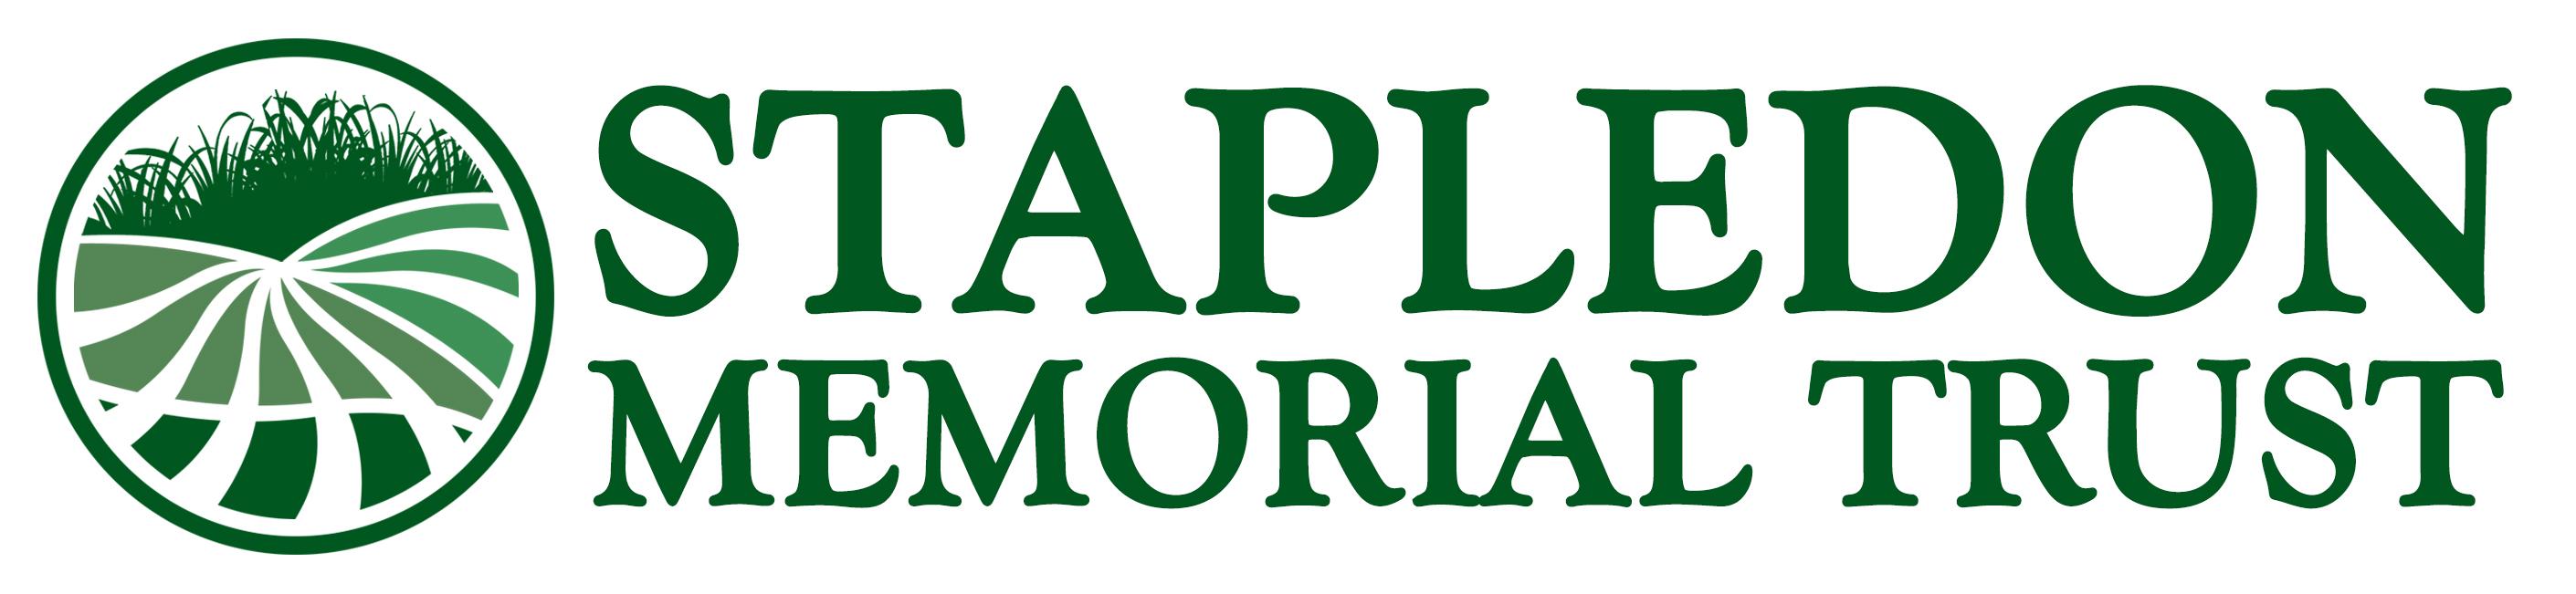 Stapledon Memorial Trust